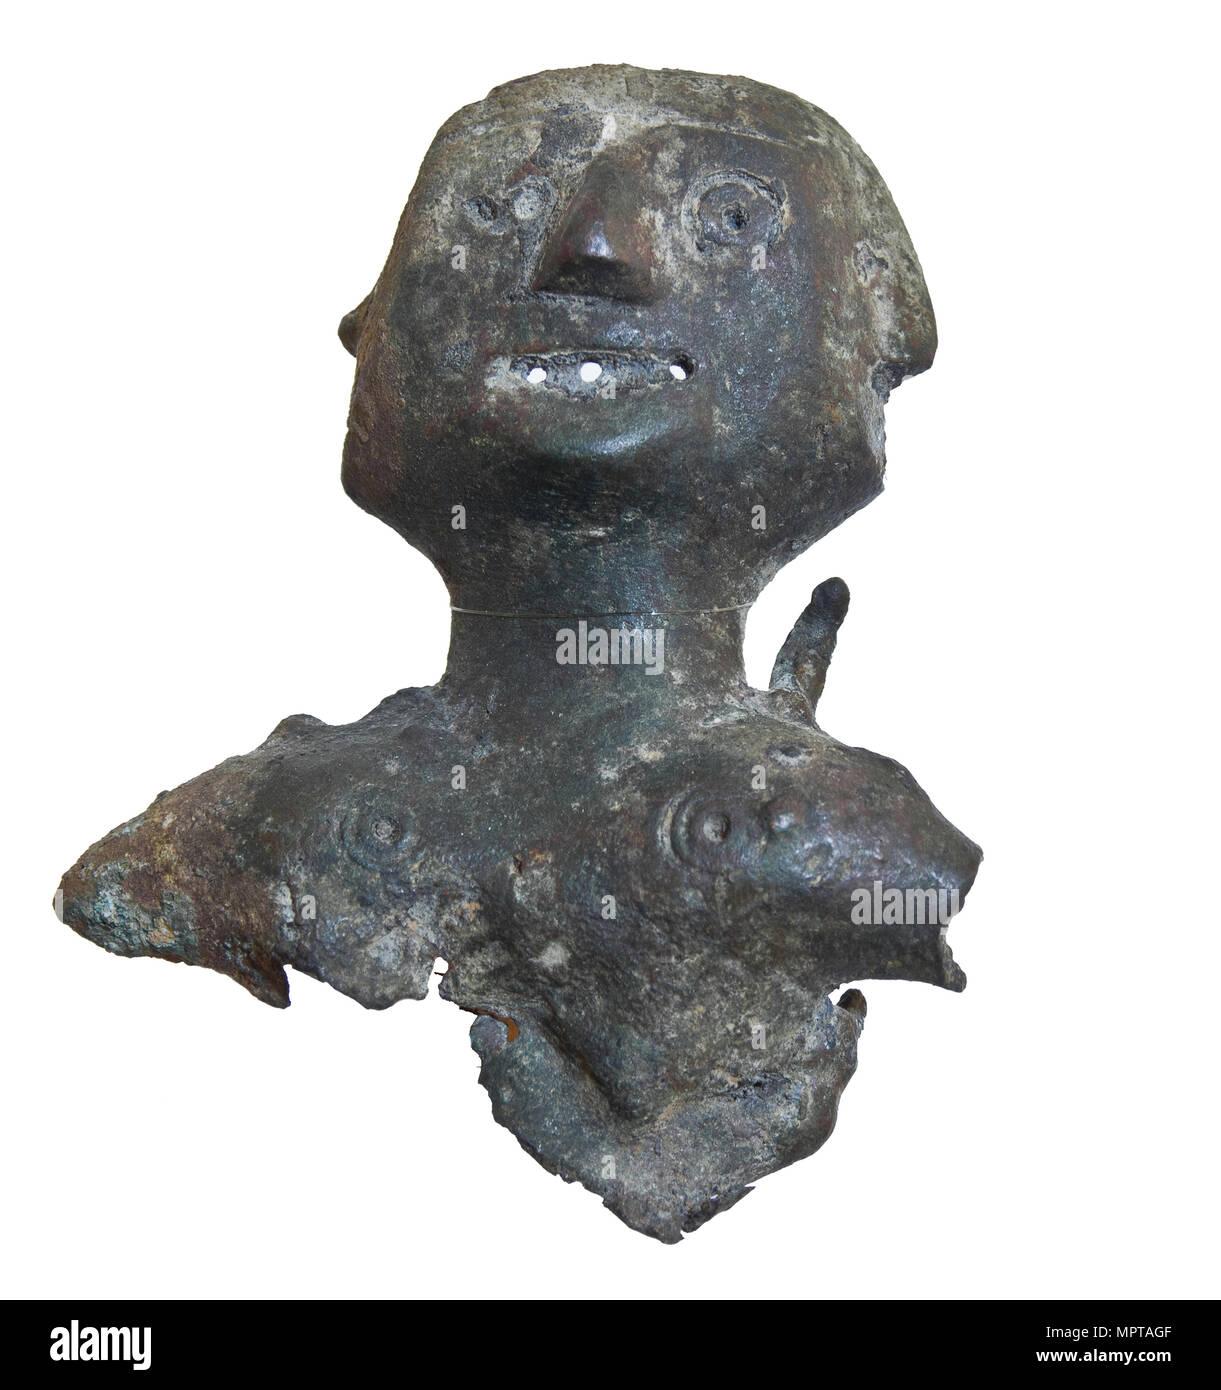 Idol from Old Ryazan. - Stock Image